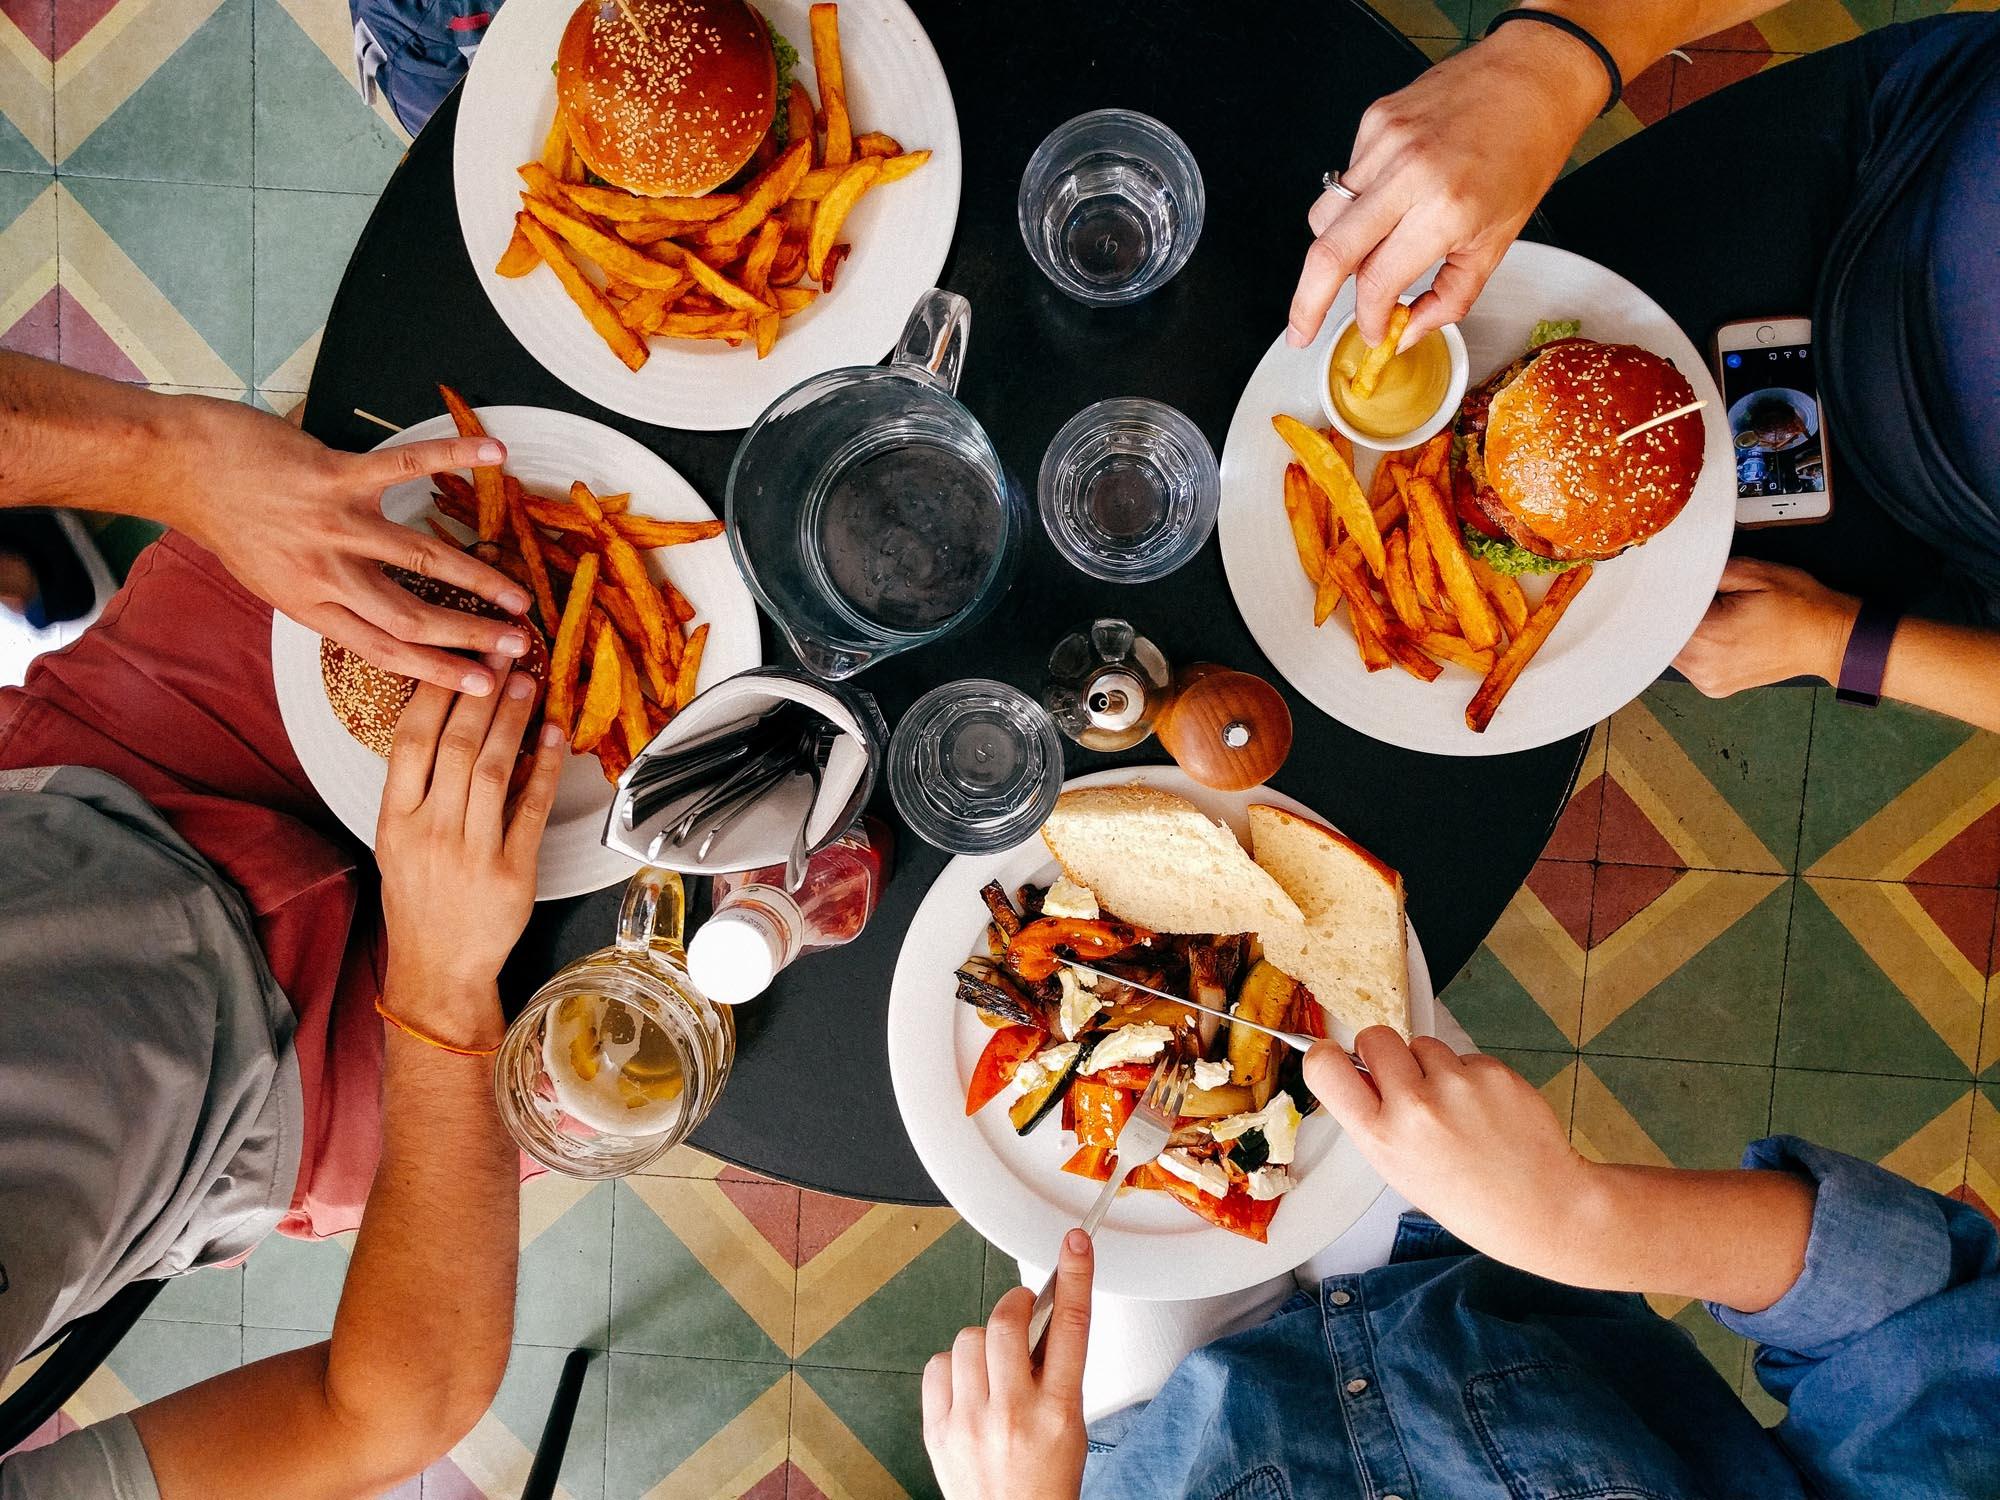 friends-eating-fries